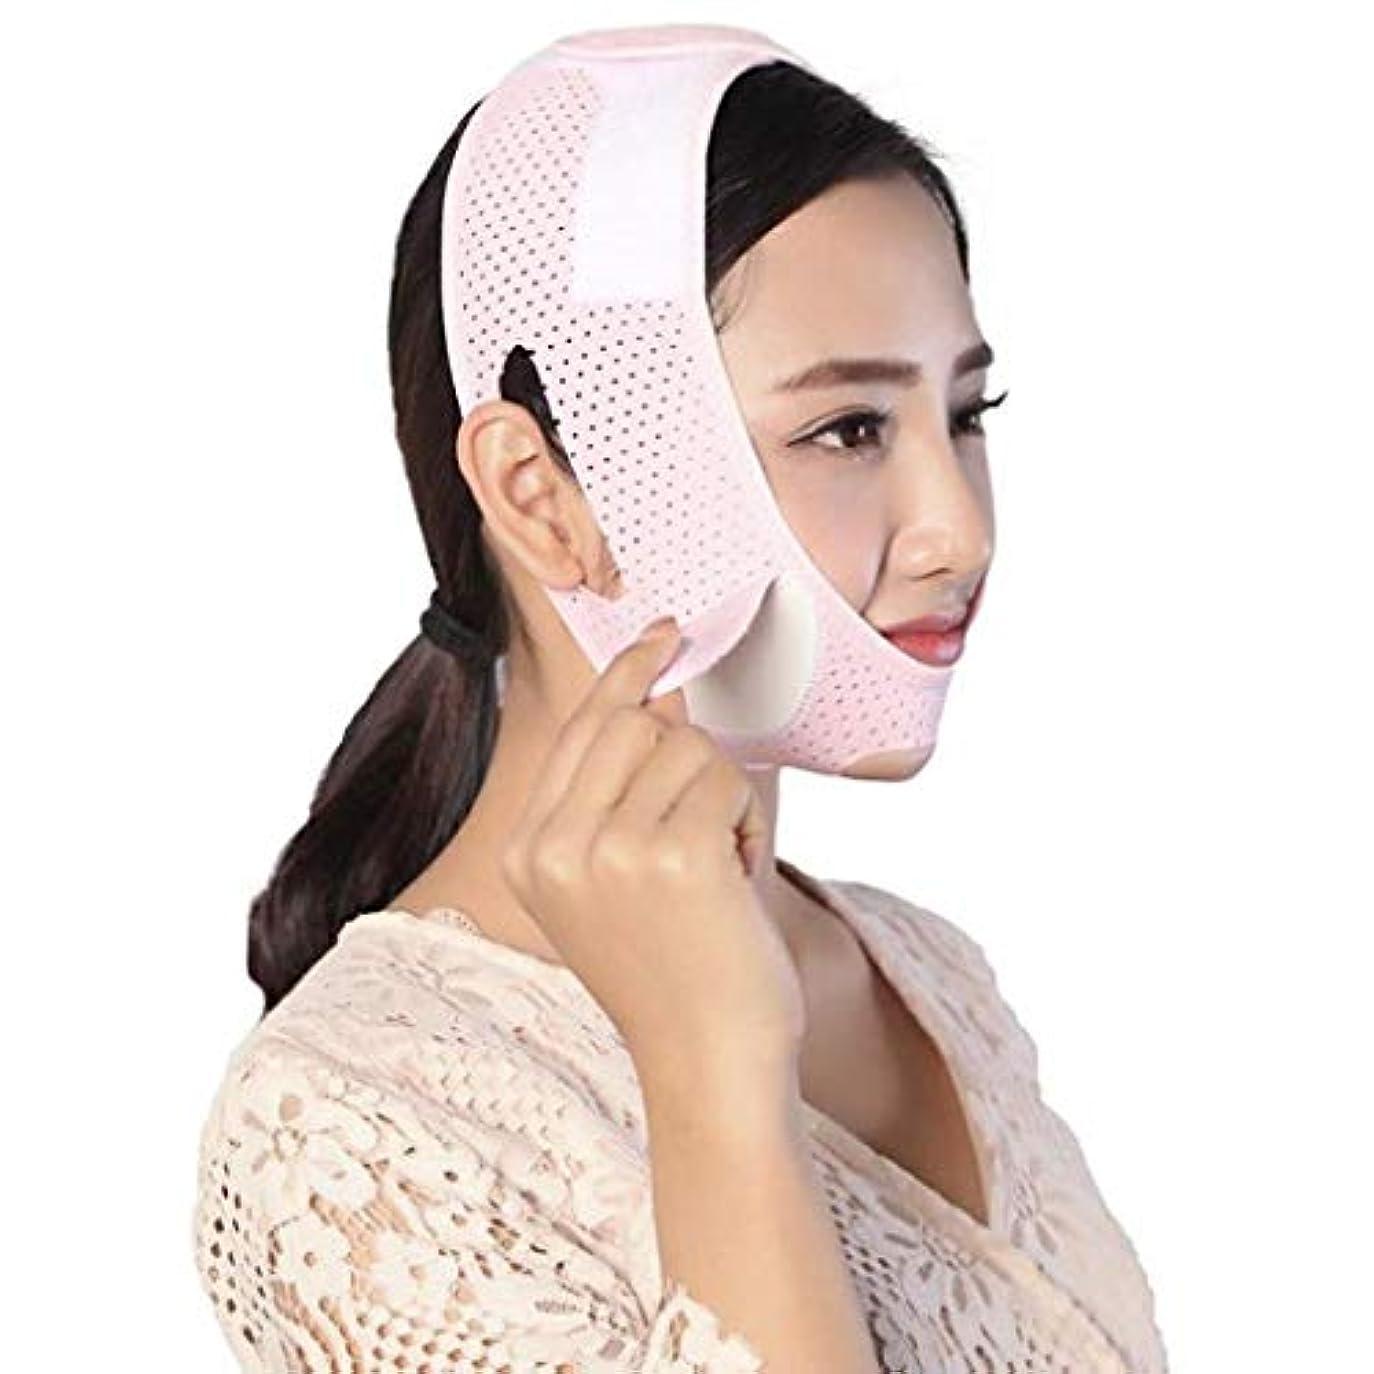 Vフェイスリフティング痩身Vフェイスマスクフルカバレッジ包帯減らす顔の二重あごケア減量美容ベルト通気性